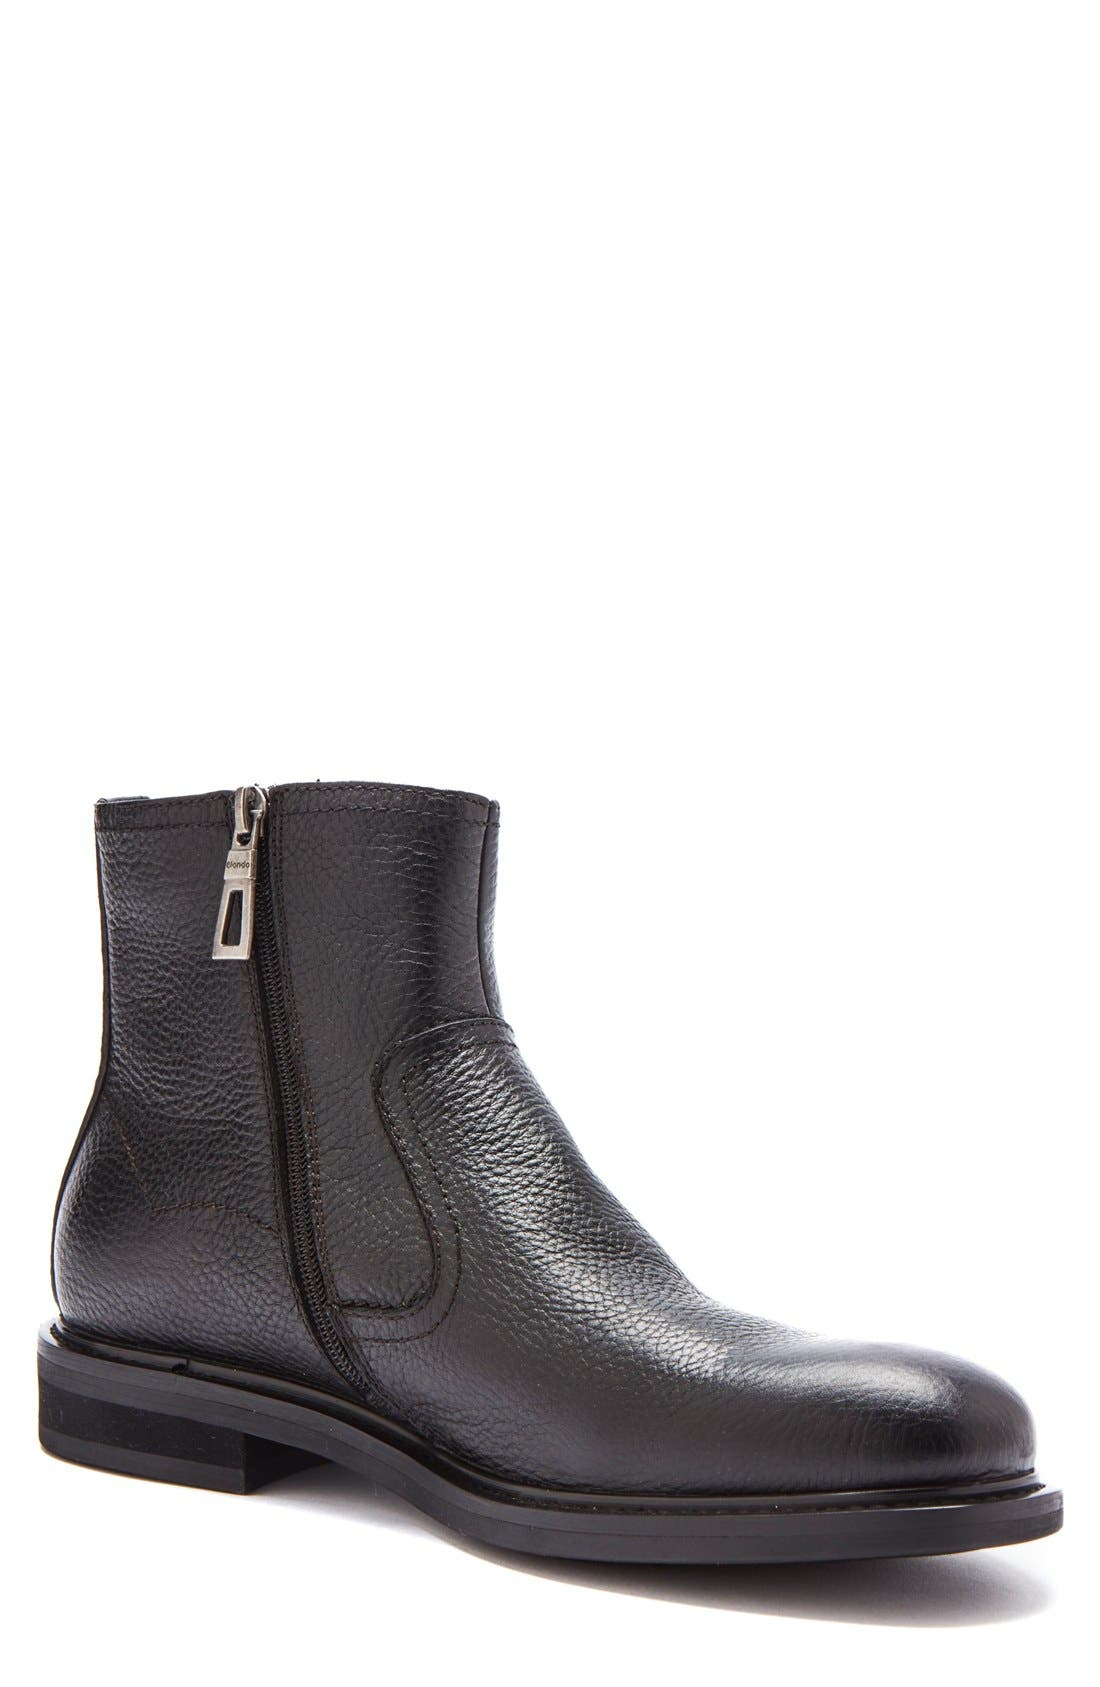 'Fried' Waterproof Zip Boot,                         Main,                         color, 001